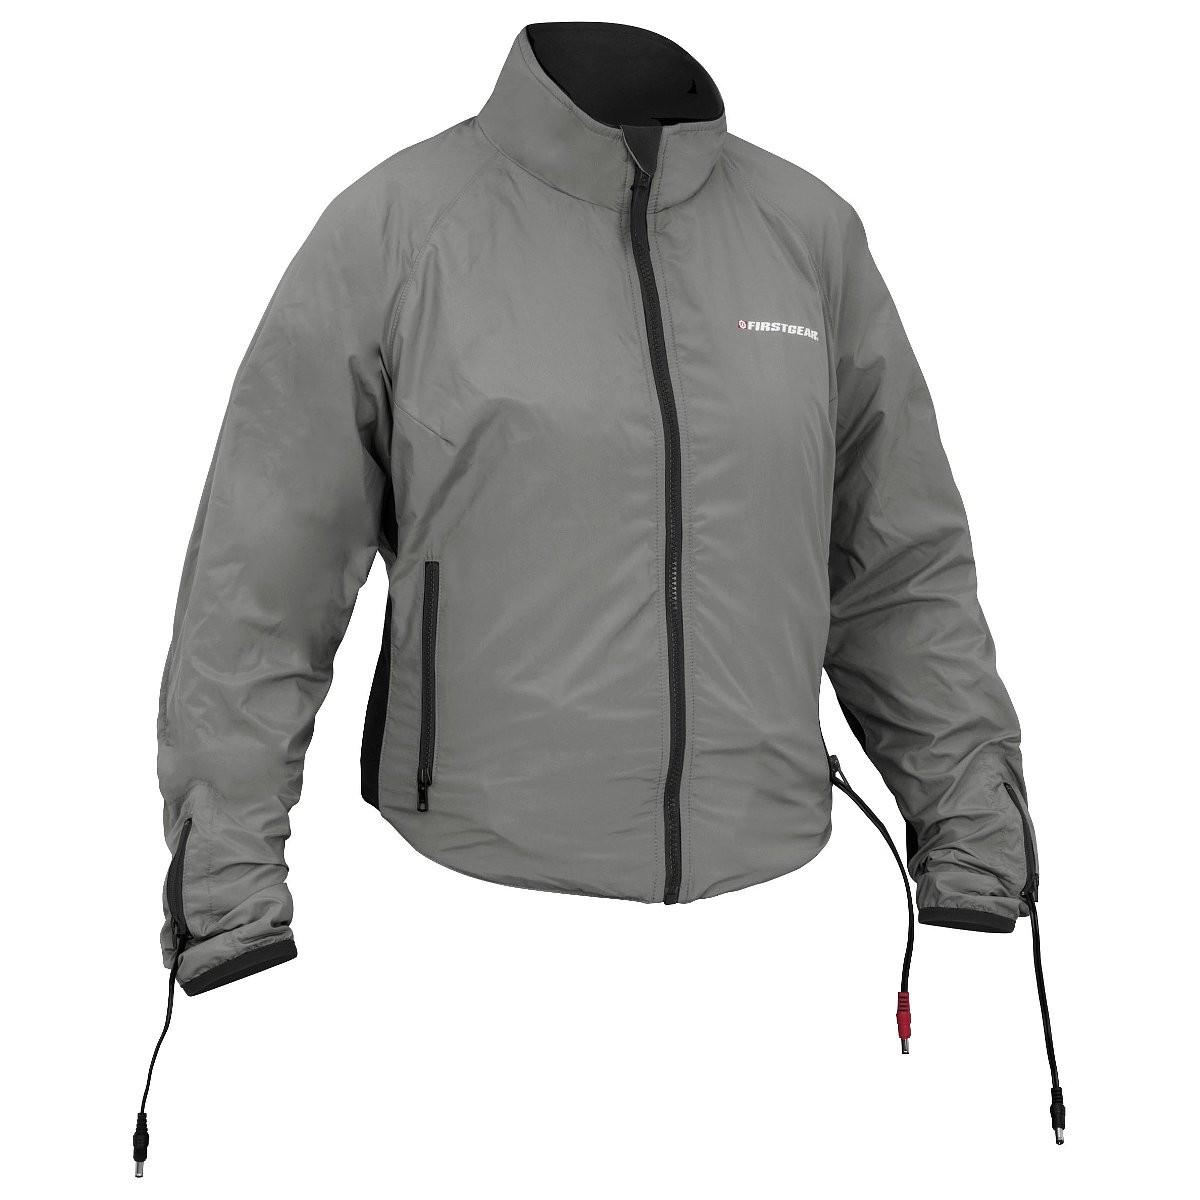 Heated jacket for women